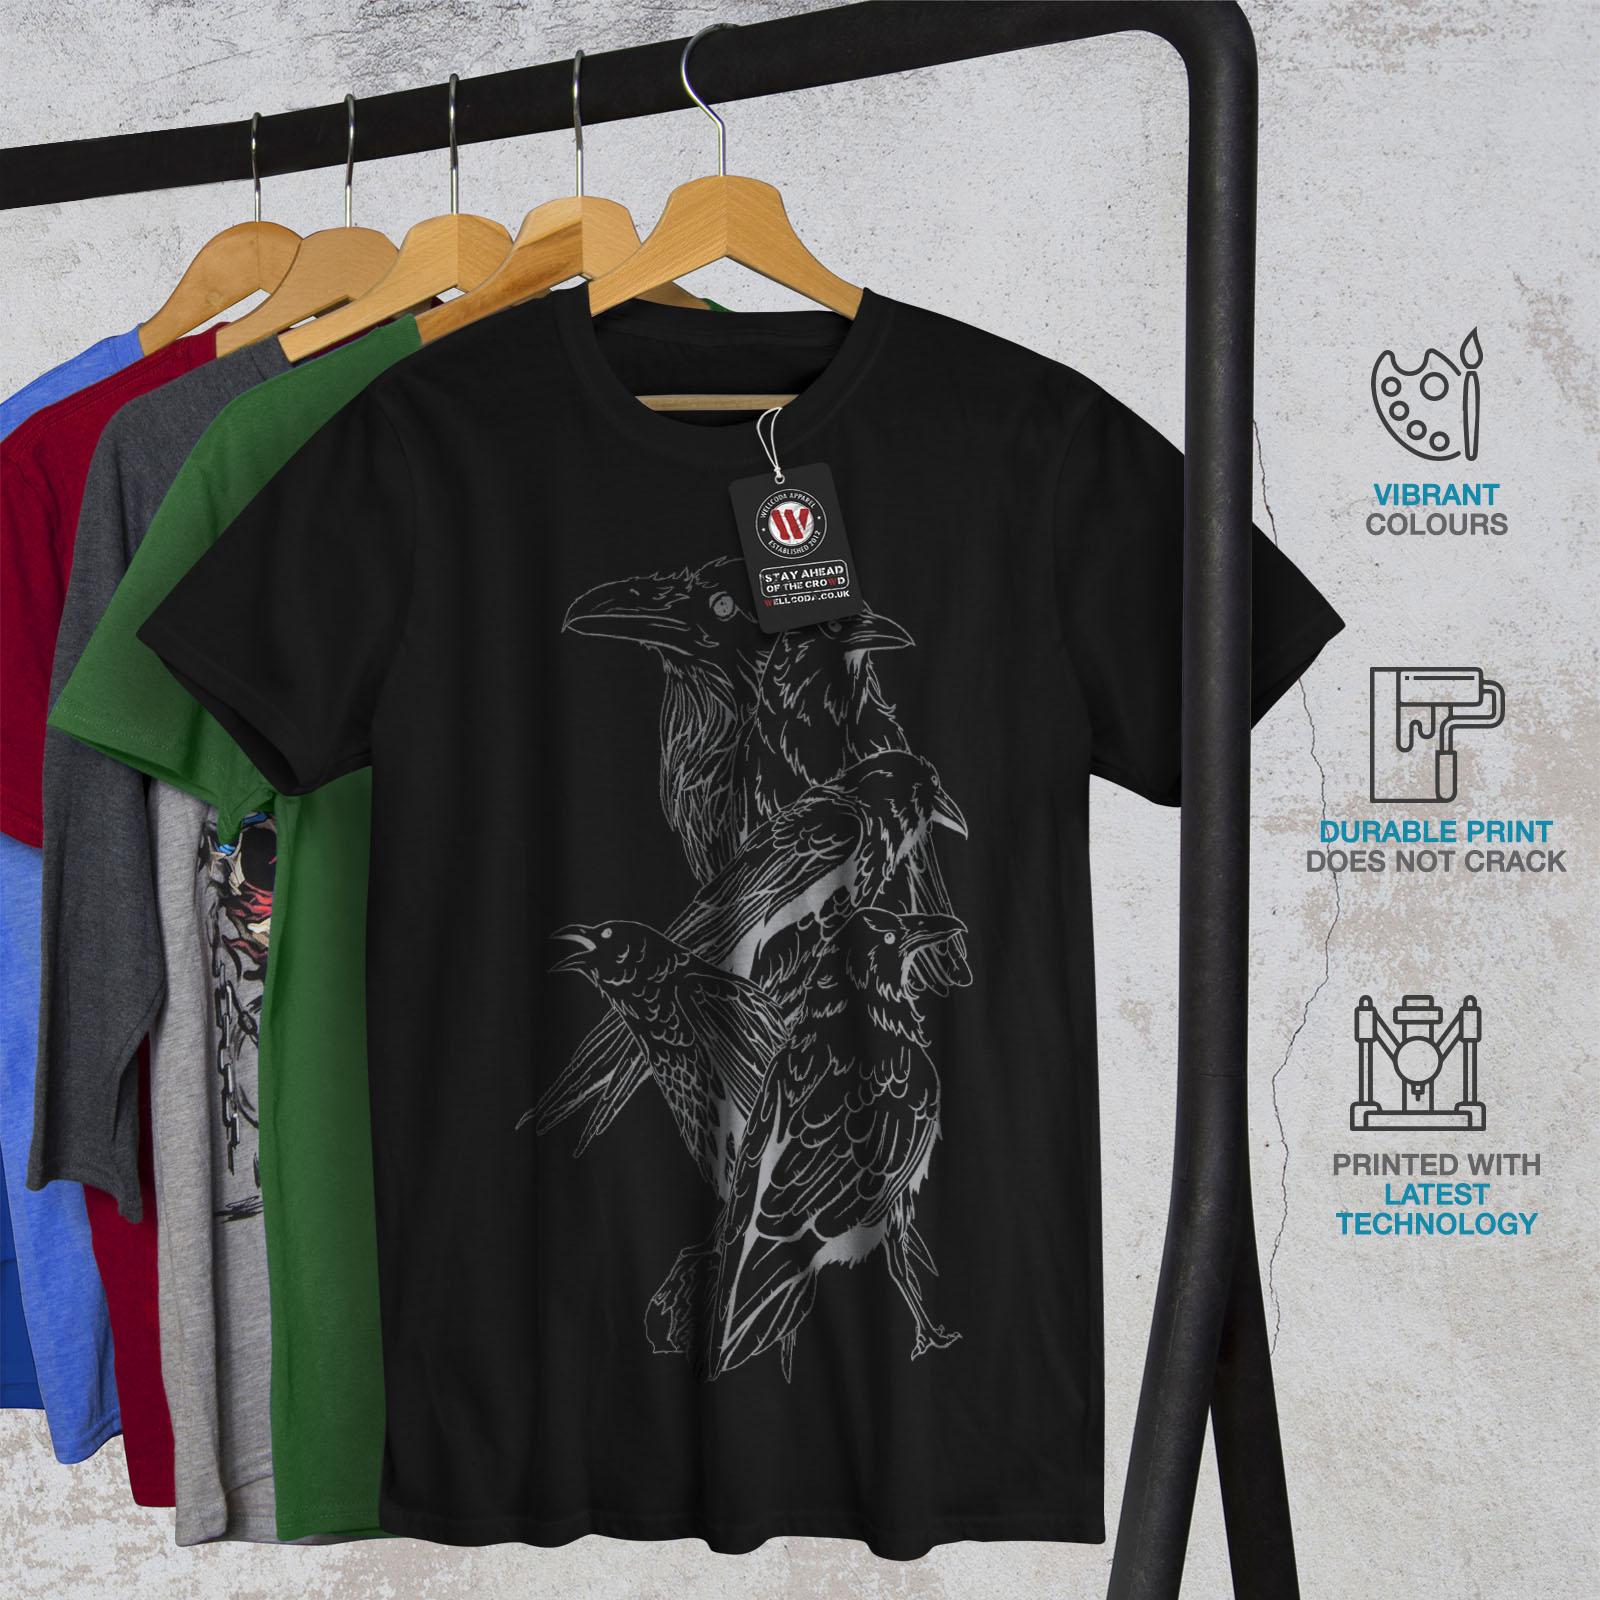 miniature 6 - Wellcoda Four Scary Raven Mens T-shirt, Crow Birds Graphic Design Printed Tee